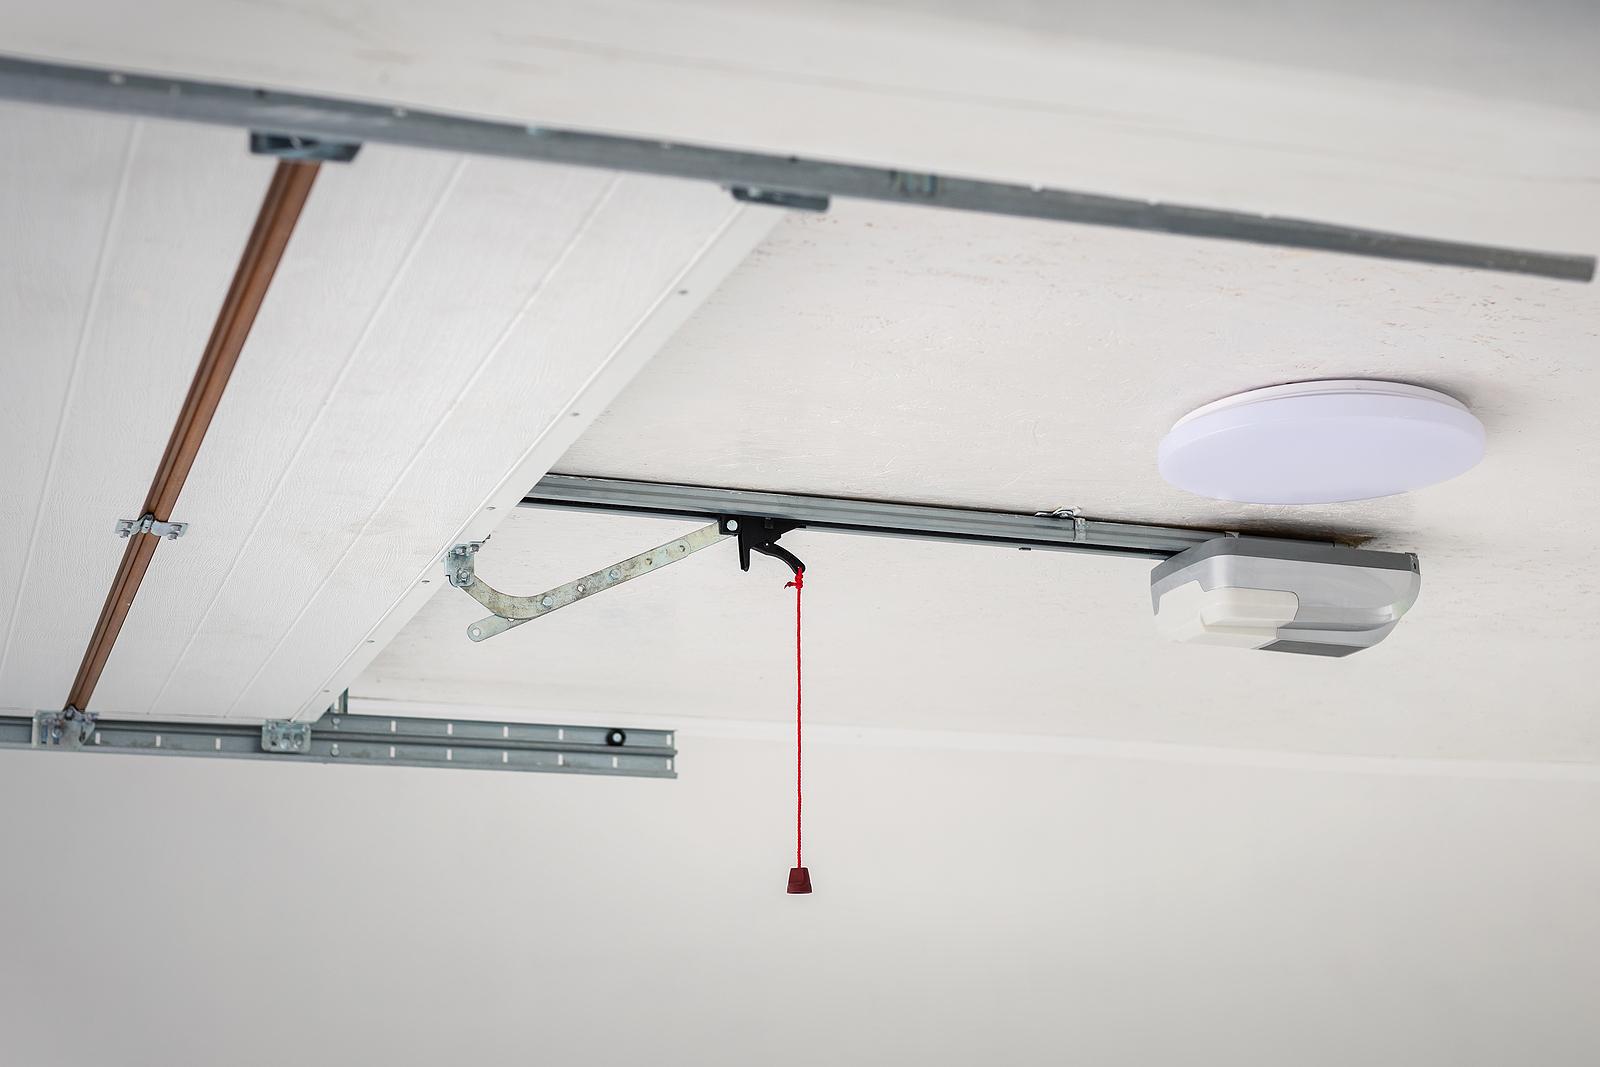 Opening-Garage-Door-And-Automatic-Garage-Door-Opener-Mounted-on-Ceiling-With-Emergency-Cord